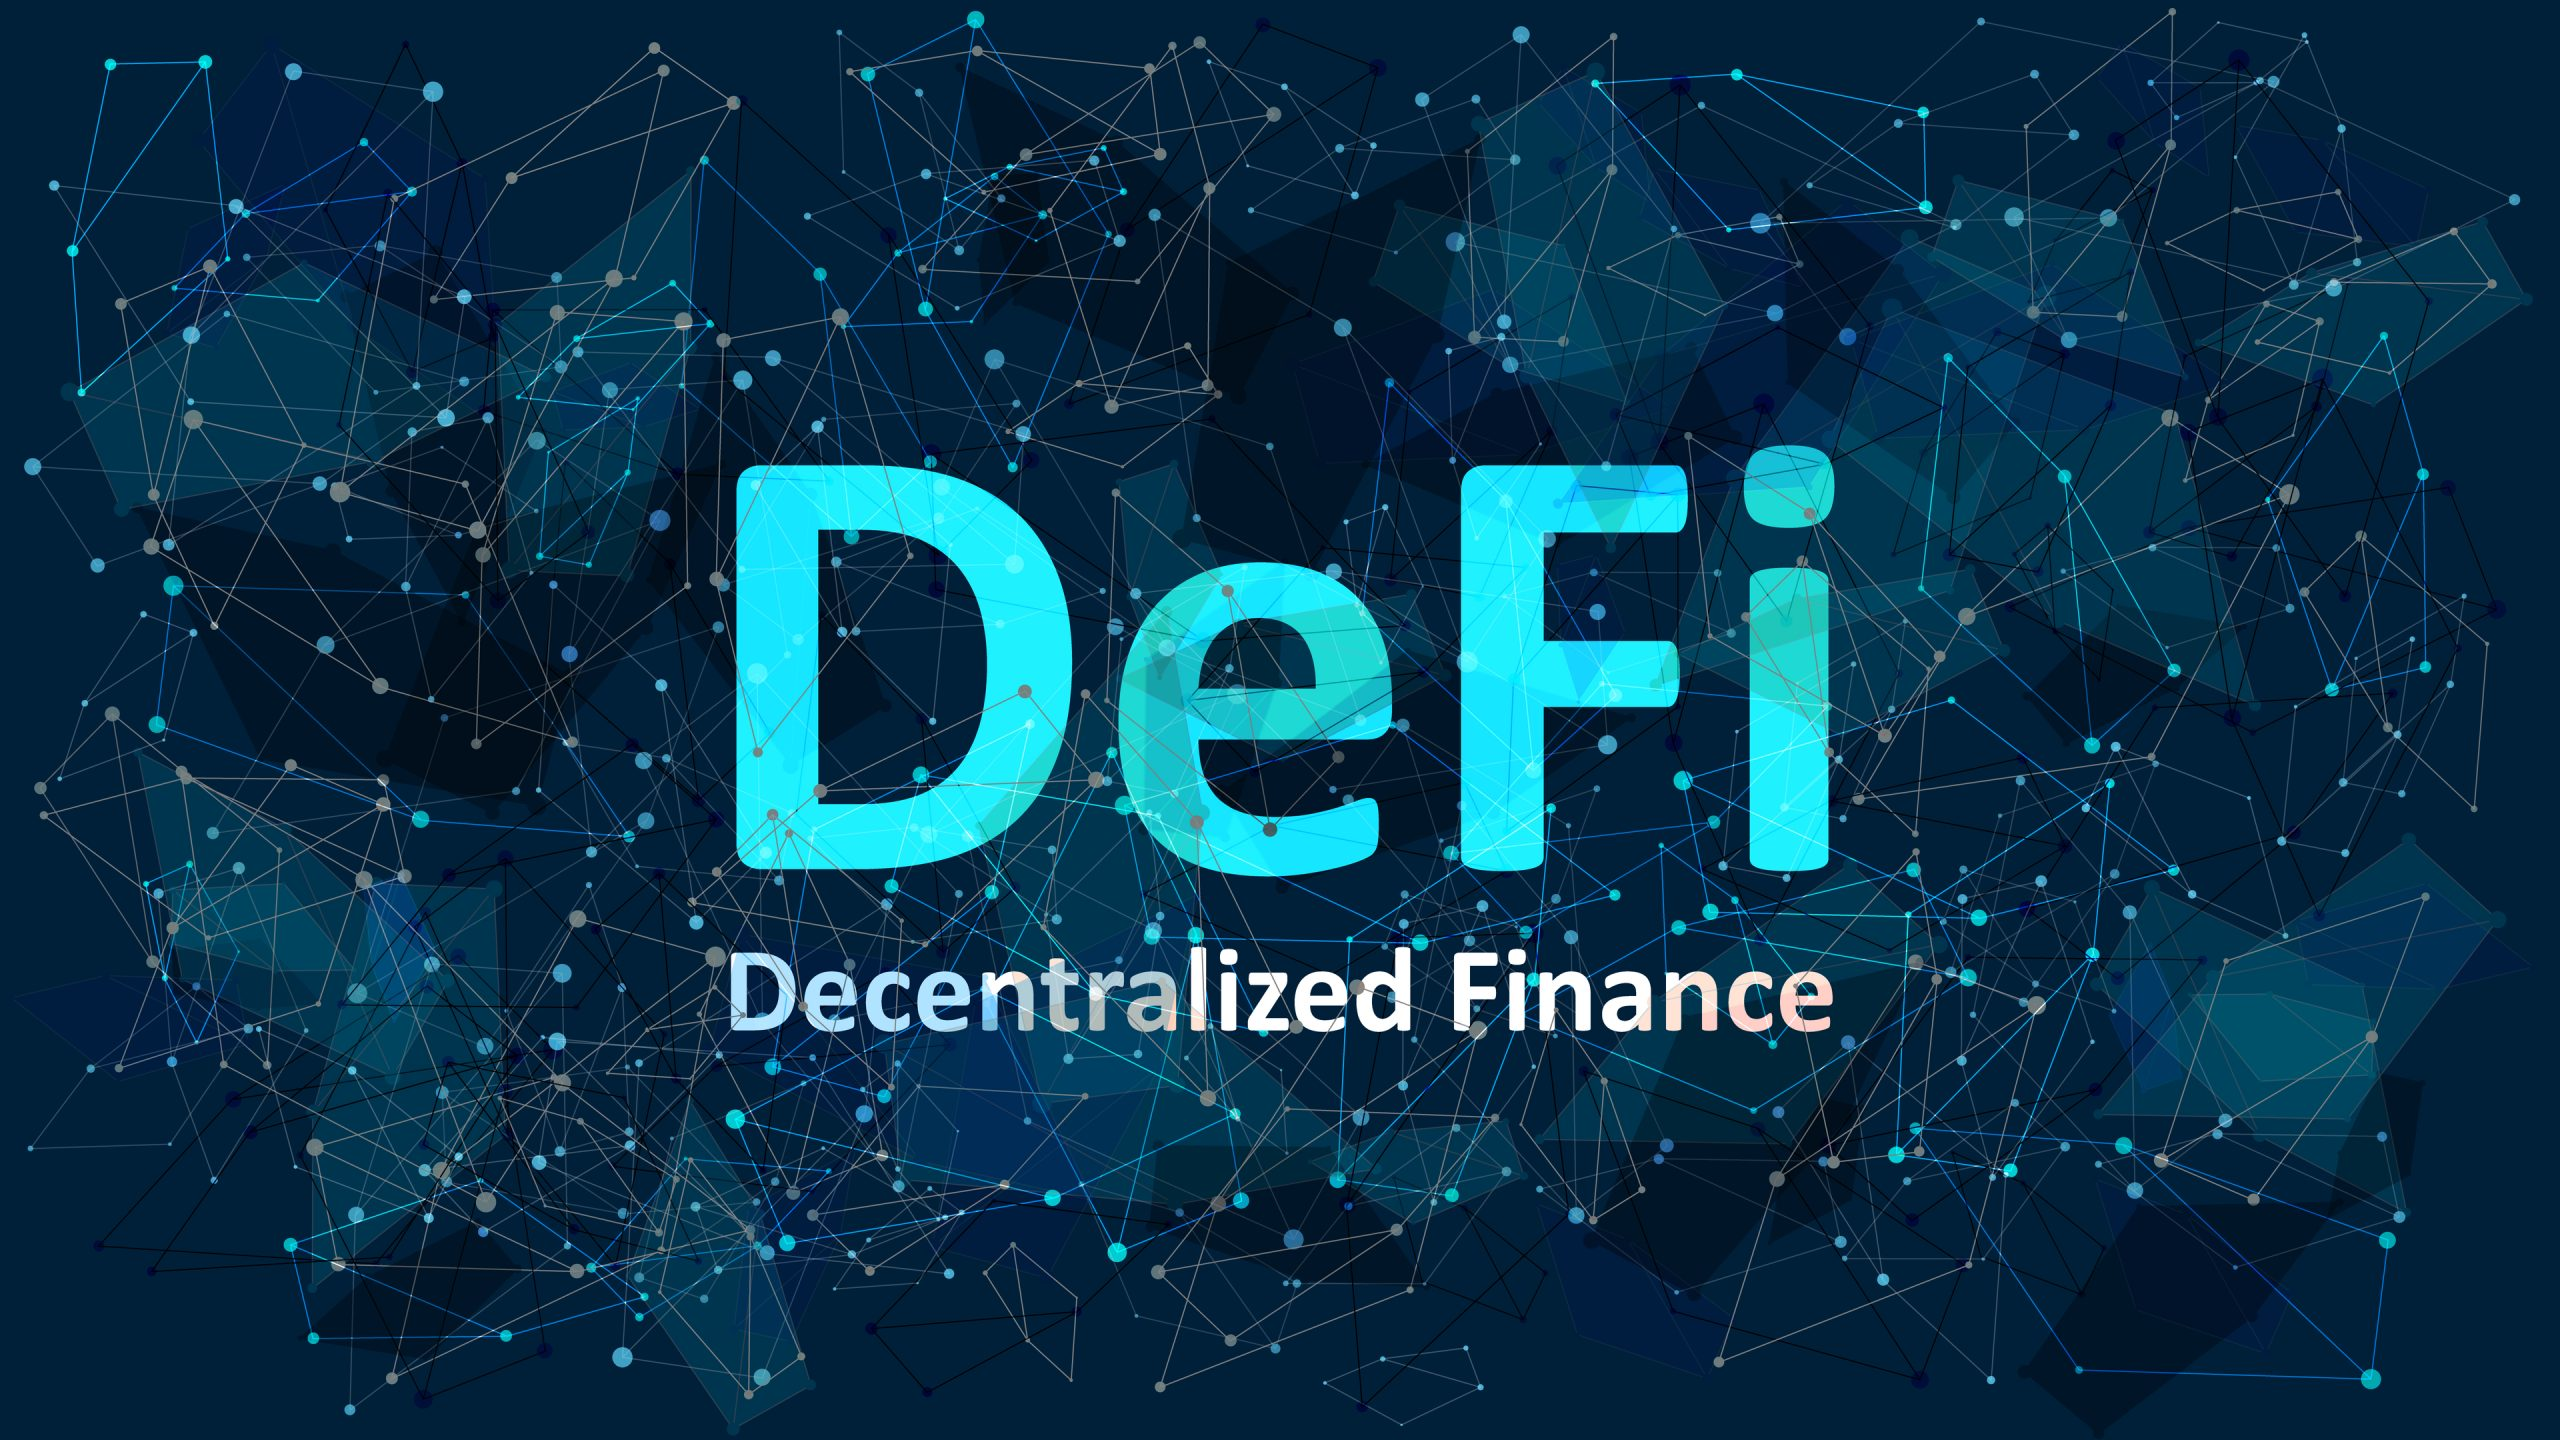 https://goodkarma.capital/wp-content/uploads/2021/06/defi-decentralized-finance-scaled.jpeg